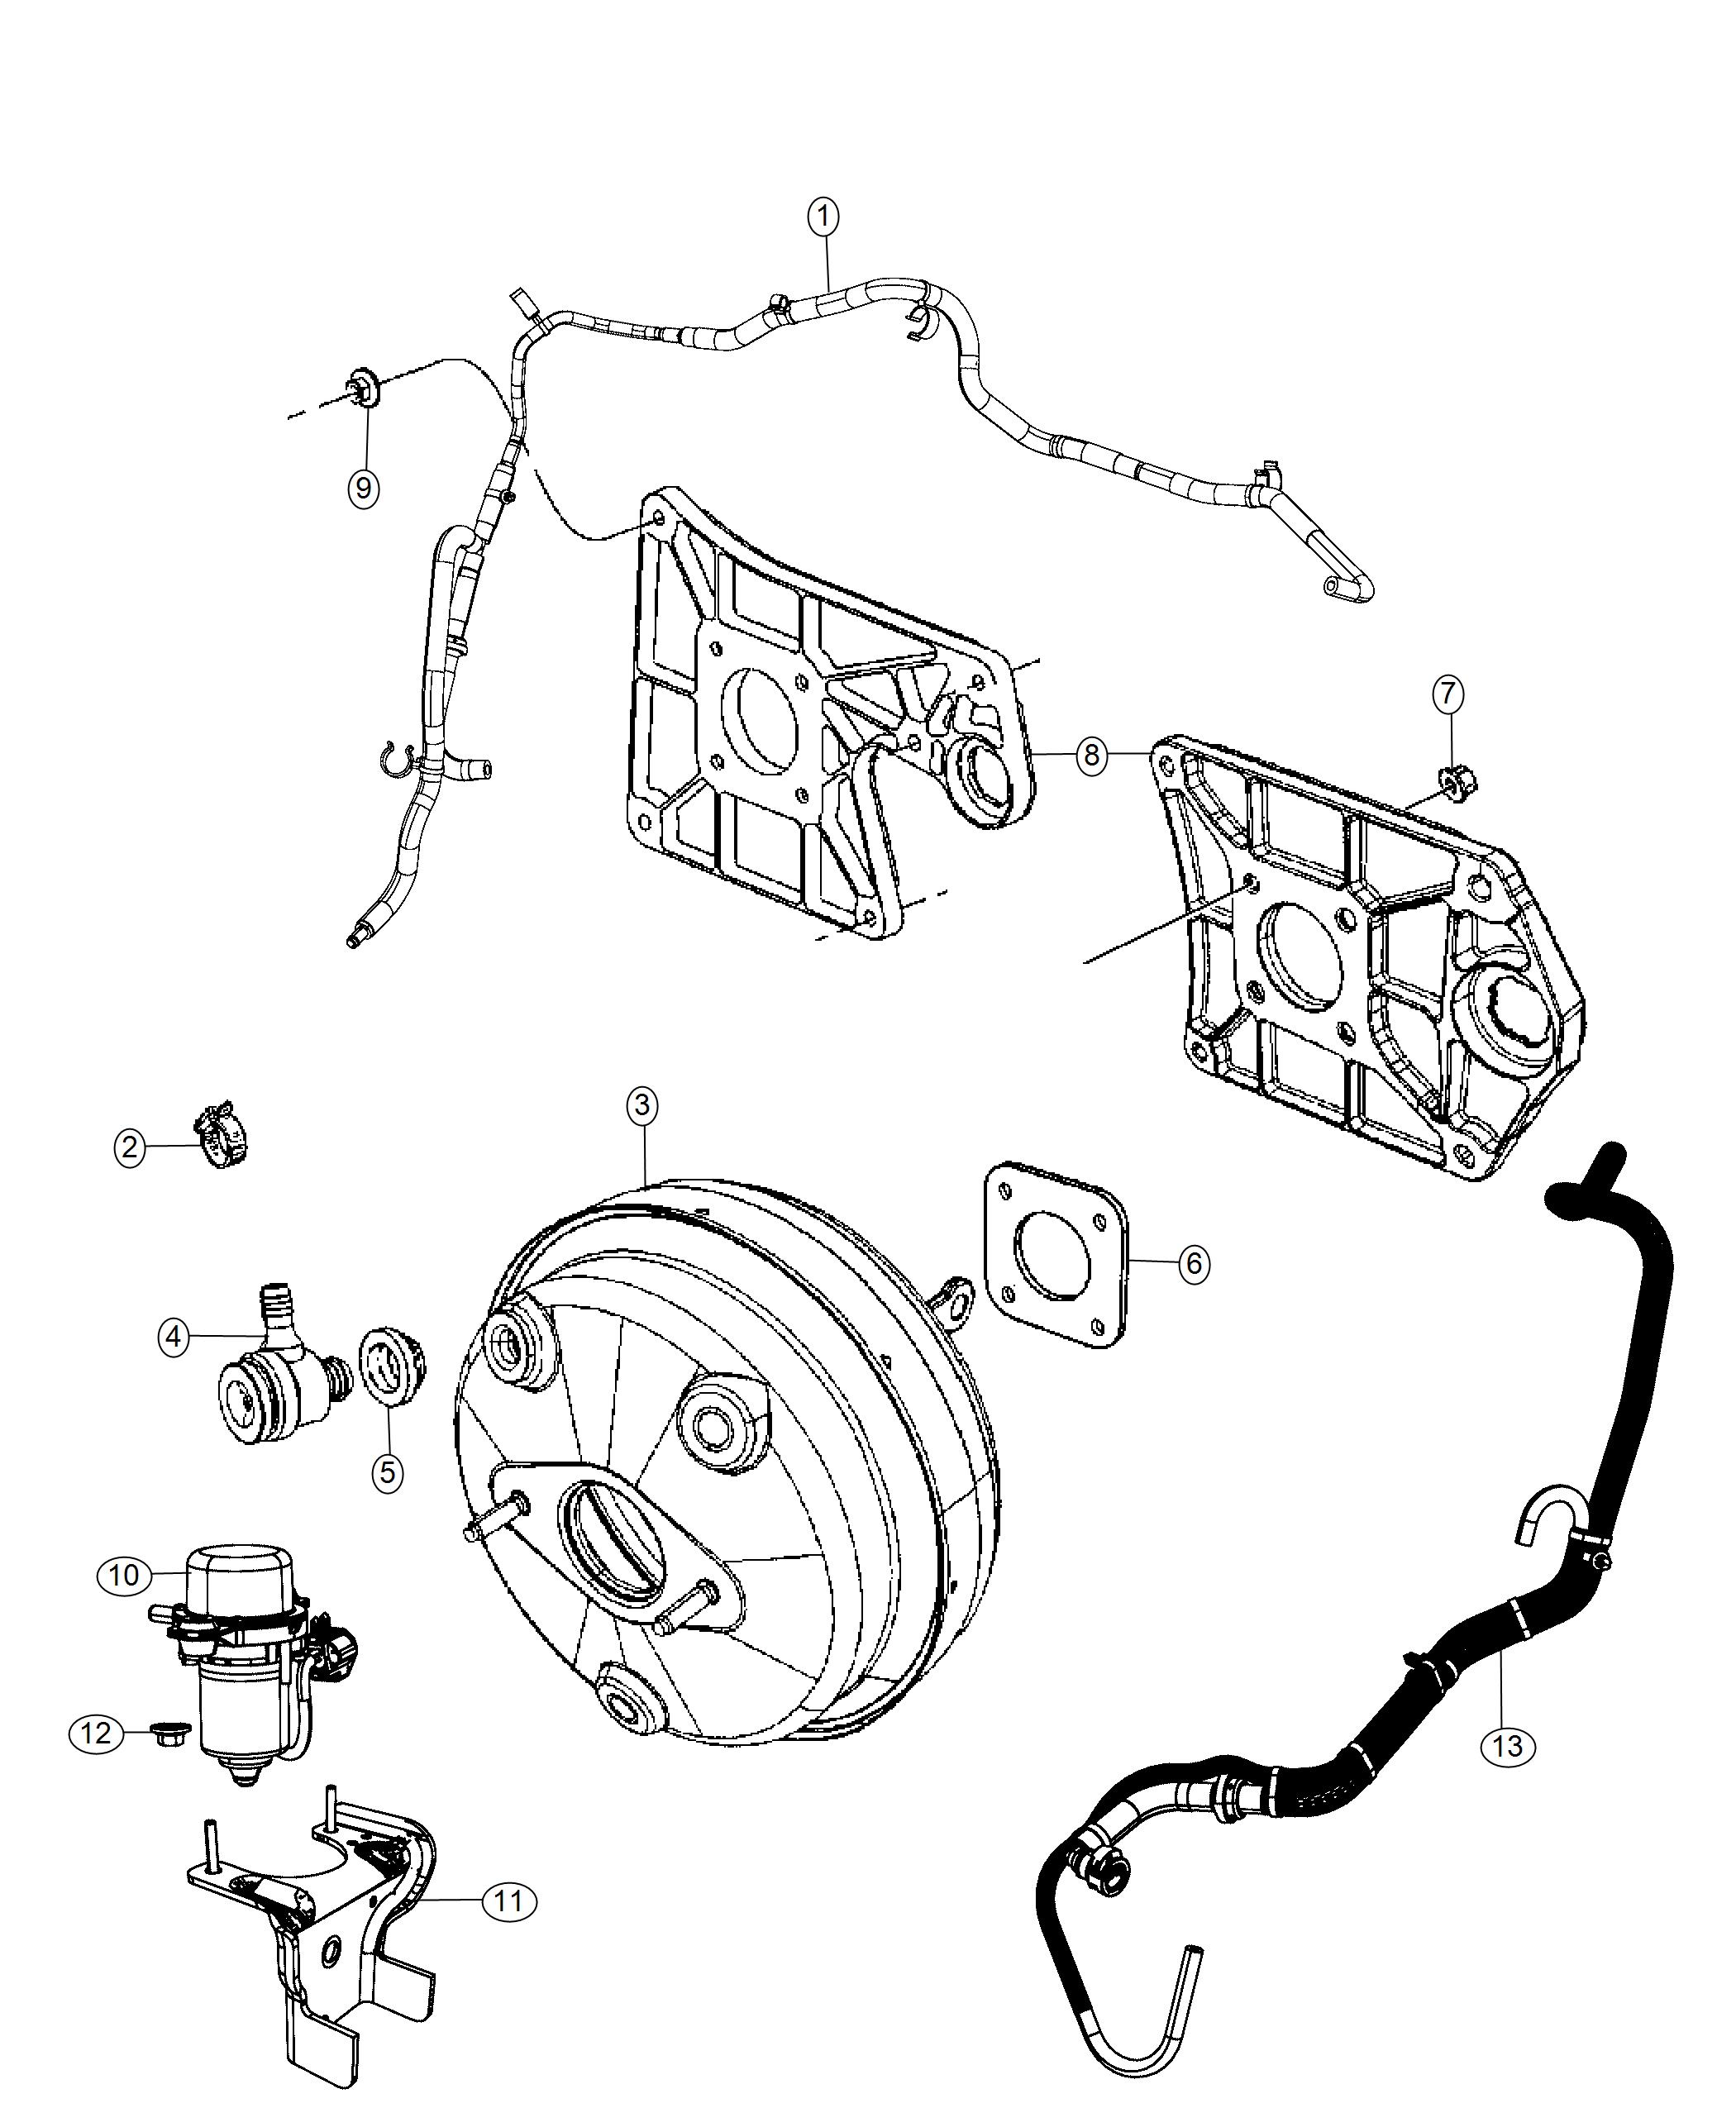 Jeep Wrangler Pump Air 3 6l V6 Vvt Engine Brake